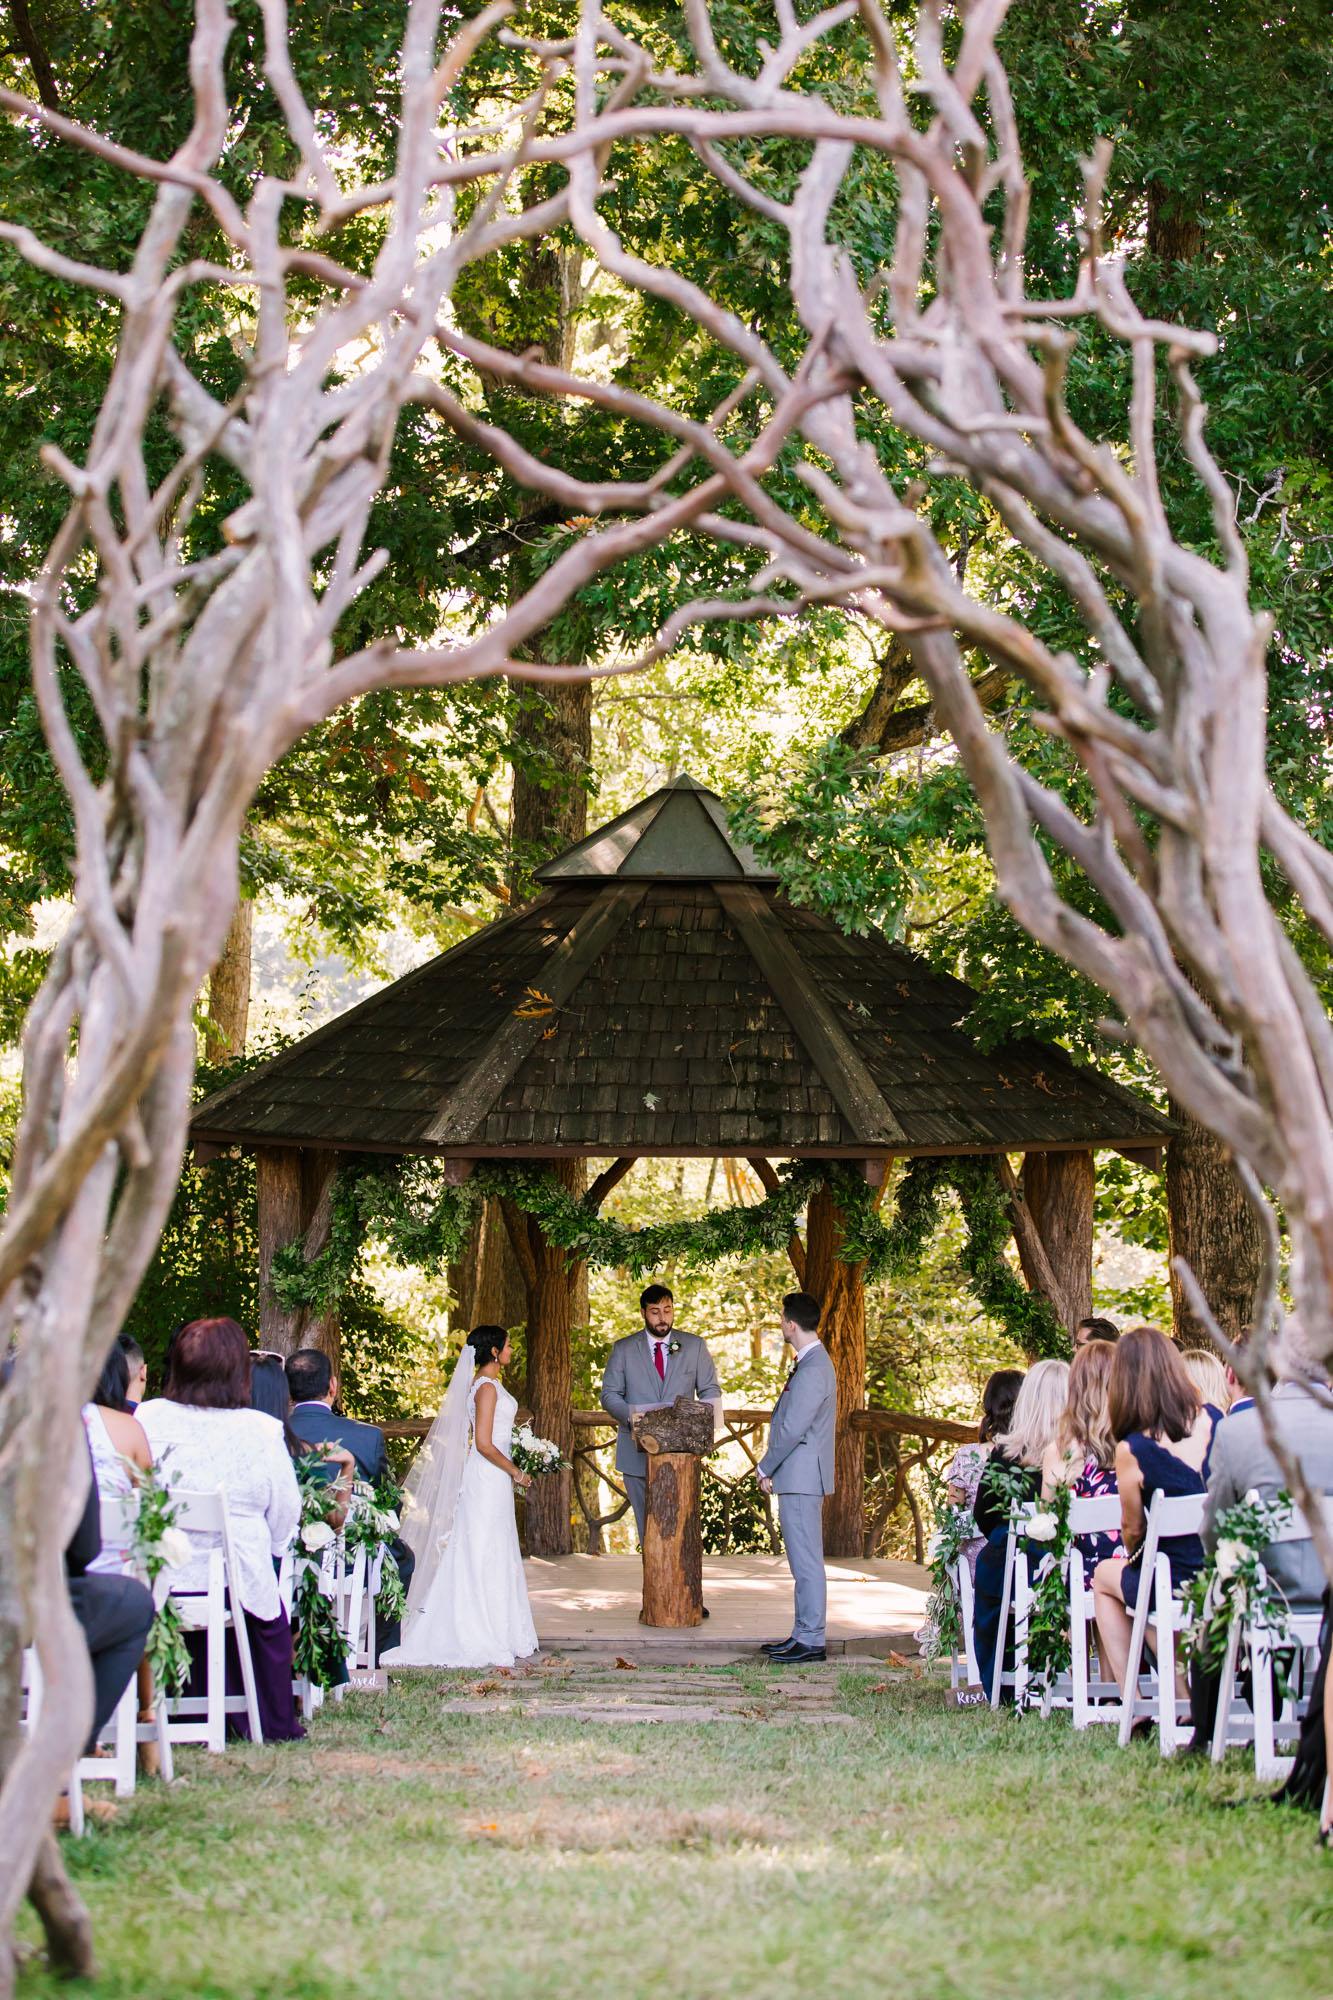 Waynesville NC Wedding Photography | Wedding Ceremony